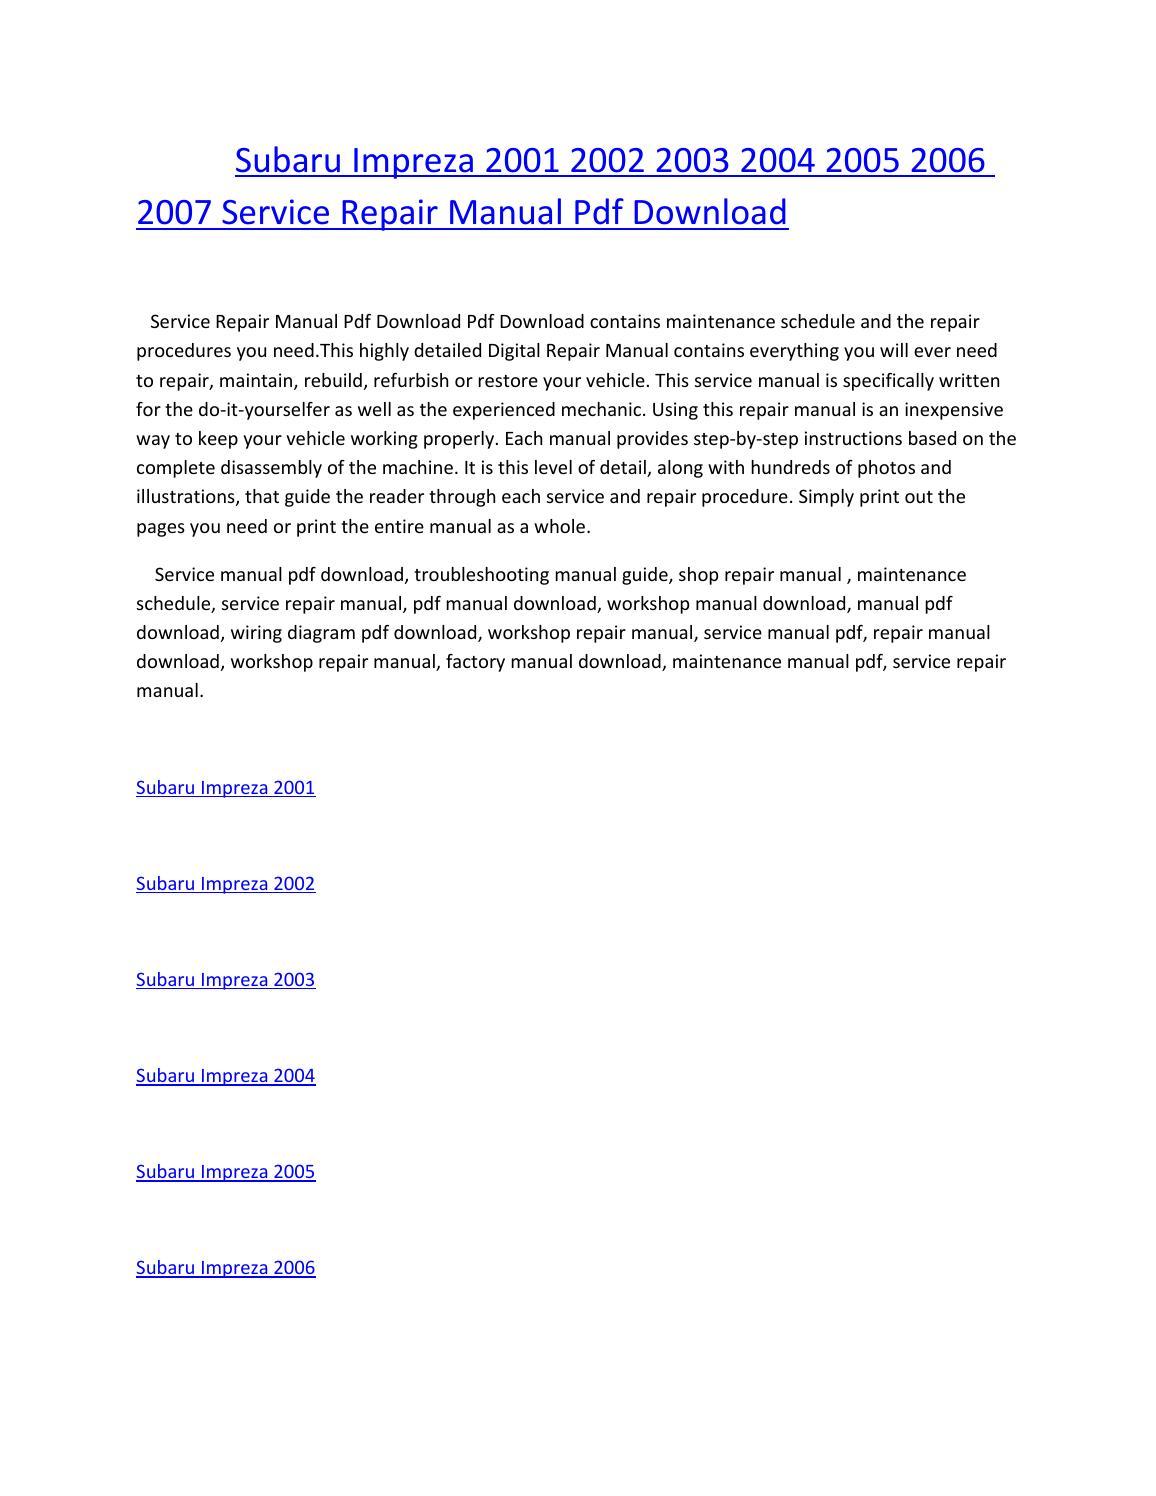 hight resolution of subaru impreza 2001 2002 2003 2004 2005 2006 2007 service repair manual pdf download by amurgului issuu